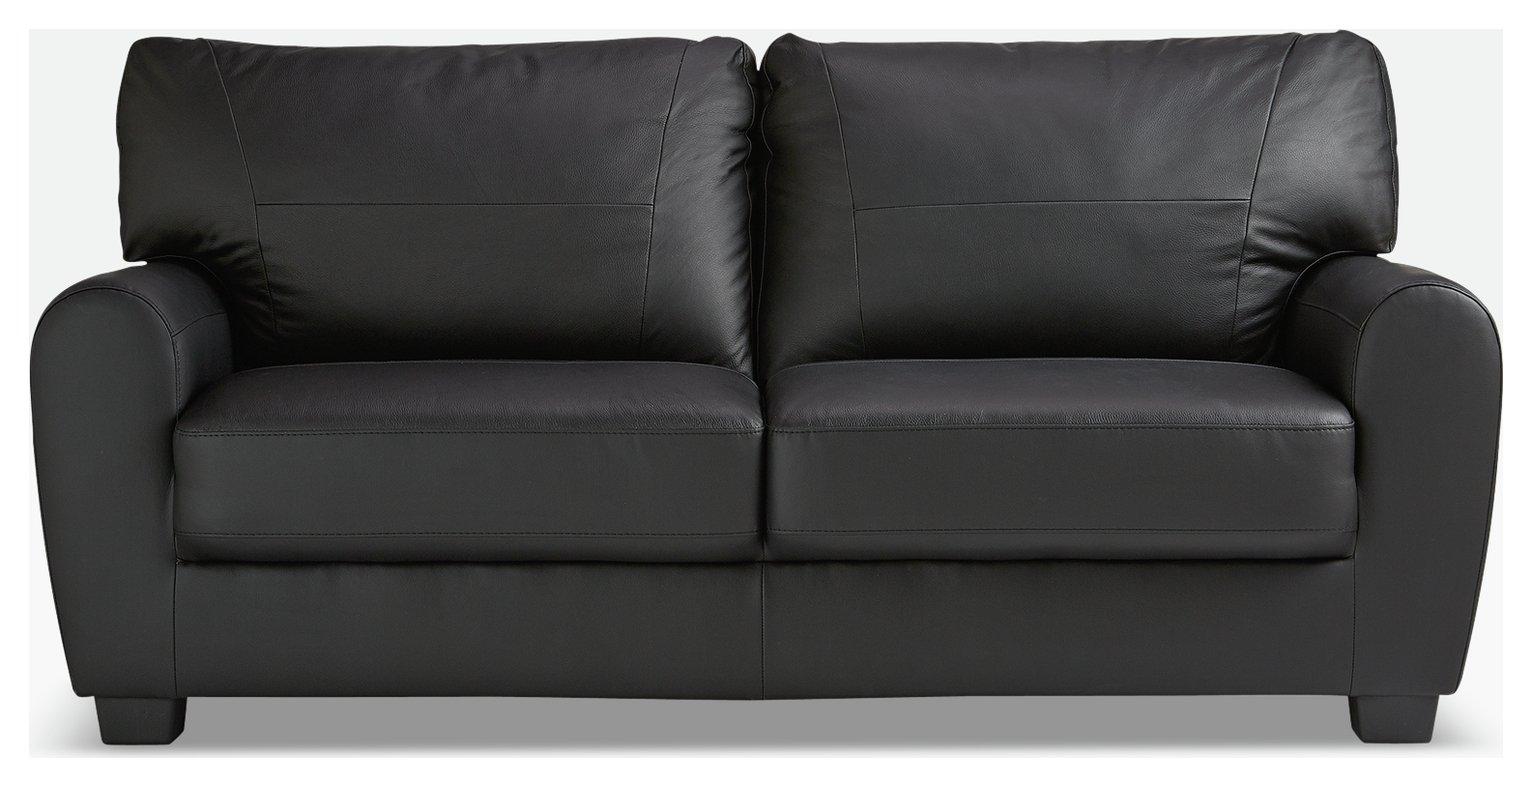 Argos Home Stefano 3 Seater Faux Leather Sofa - Black